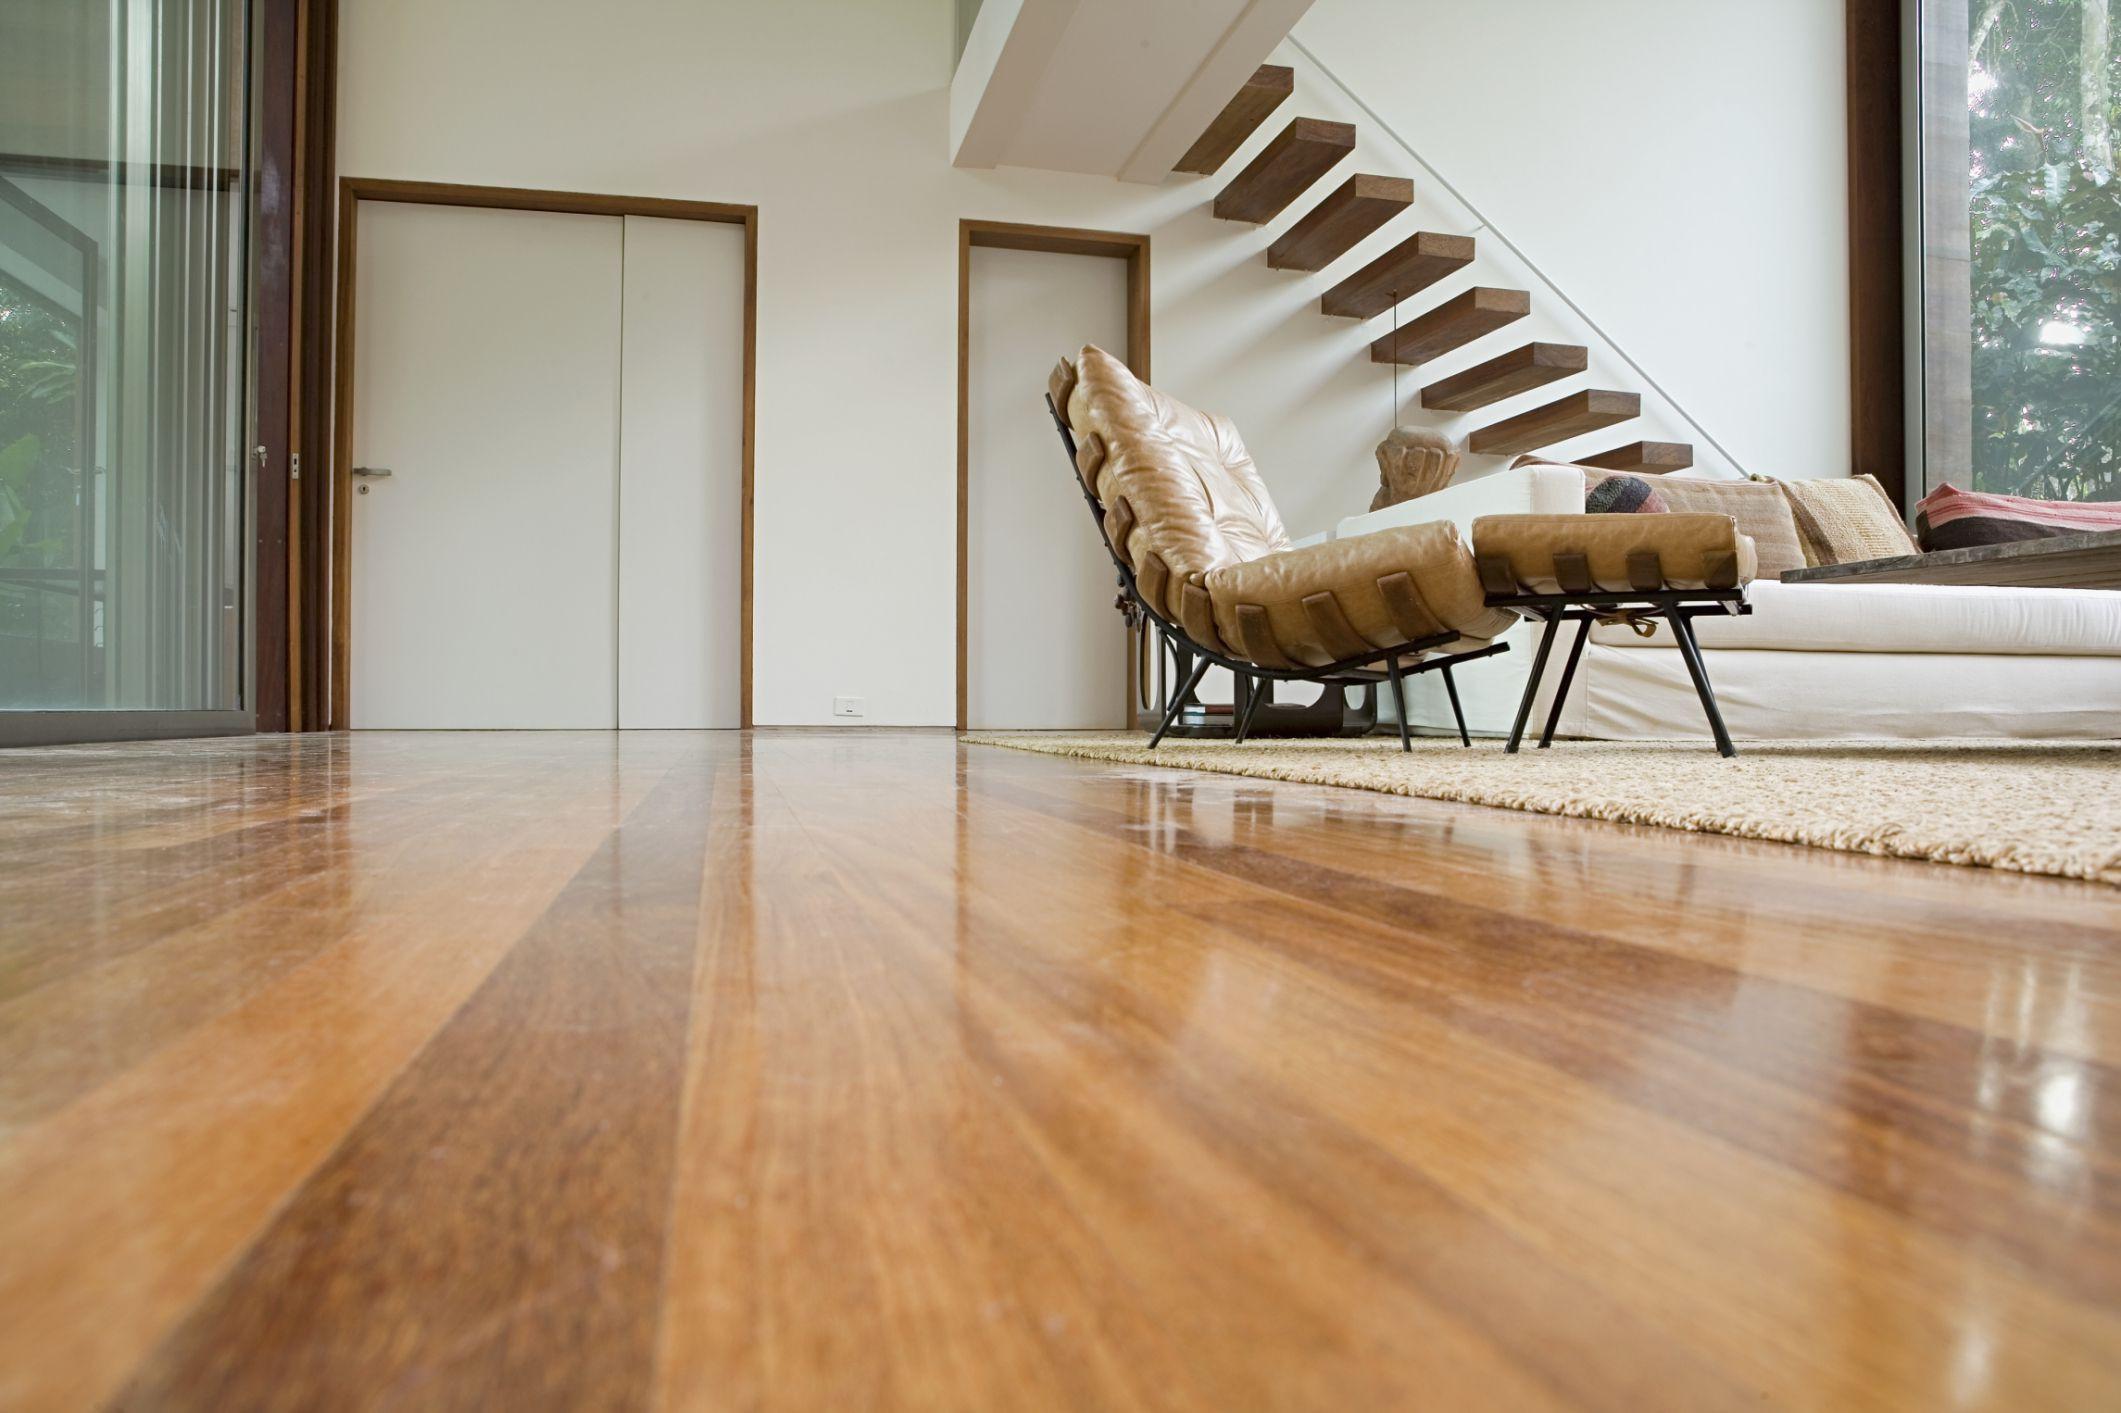 1 4 inch engineered hardwood flooring of engineered wood flooring vs solid wood flooring for 200571260 001 highres 56a49dec5f9b58b7d0d7dc1e